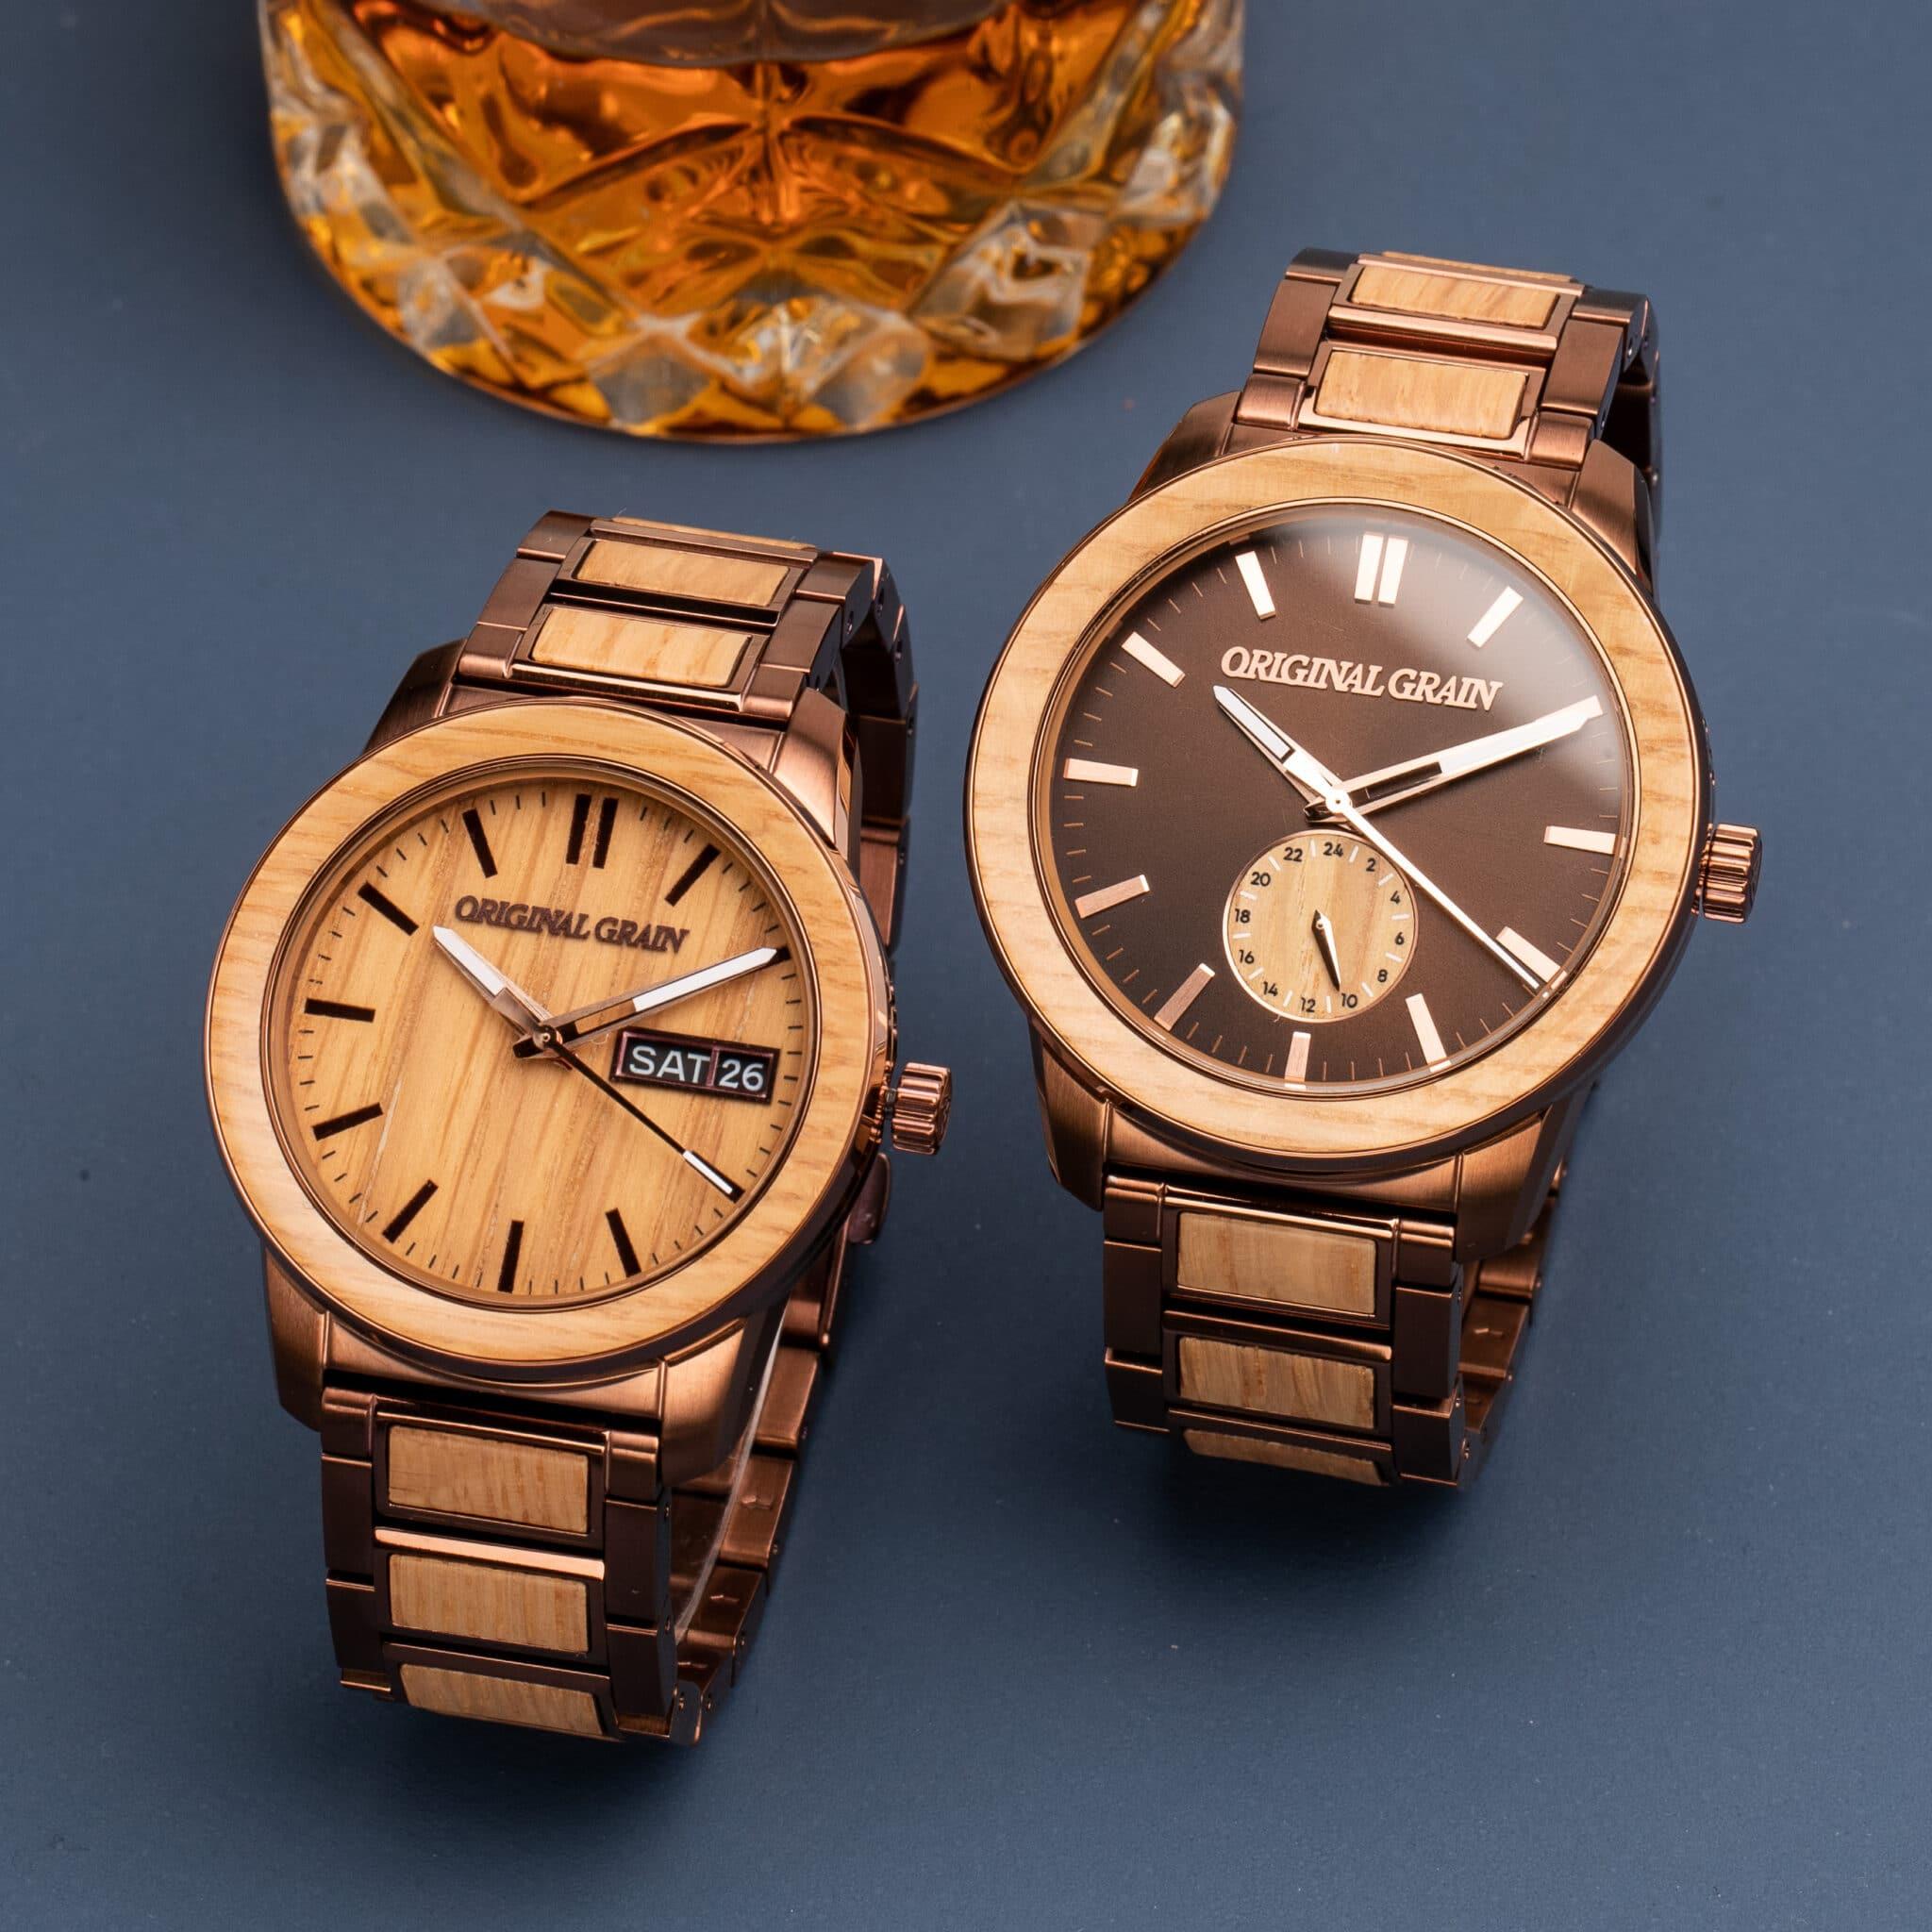 whiskey barrel original grain watches